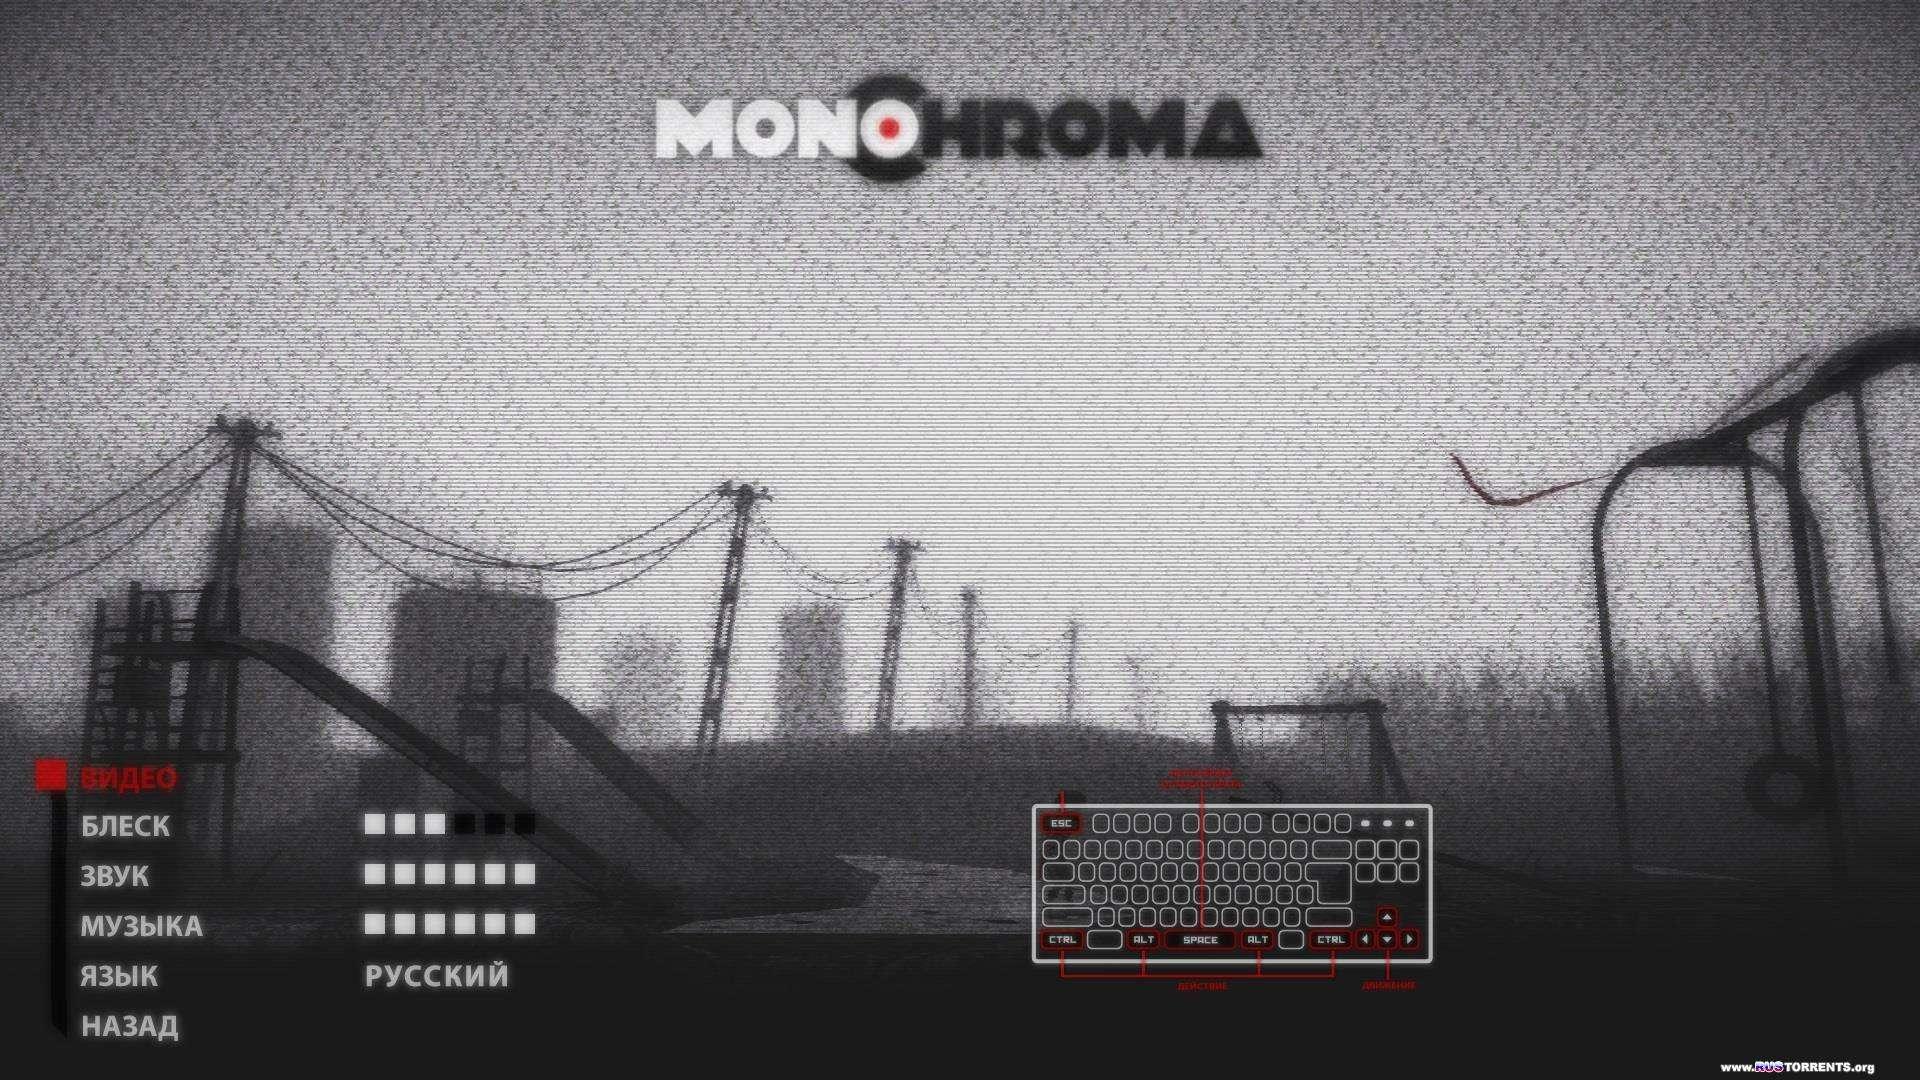 Monochroma | �� | RePack �� R.G. ��������